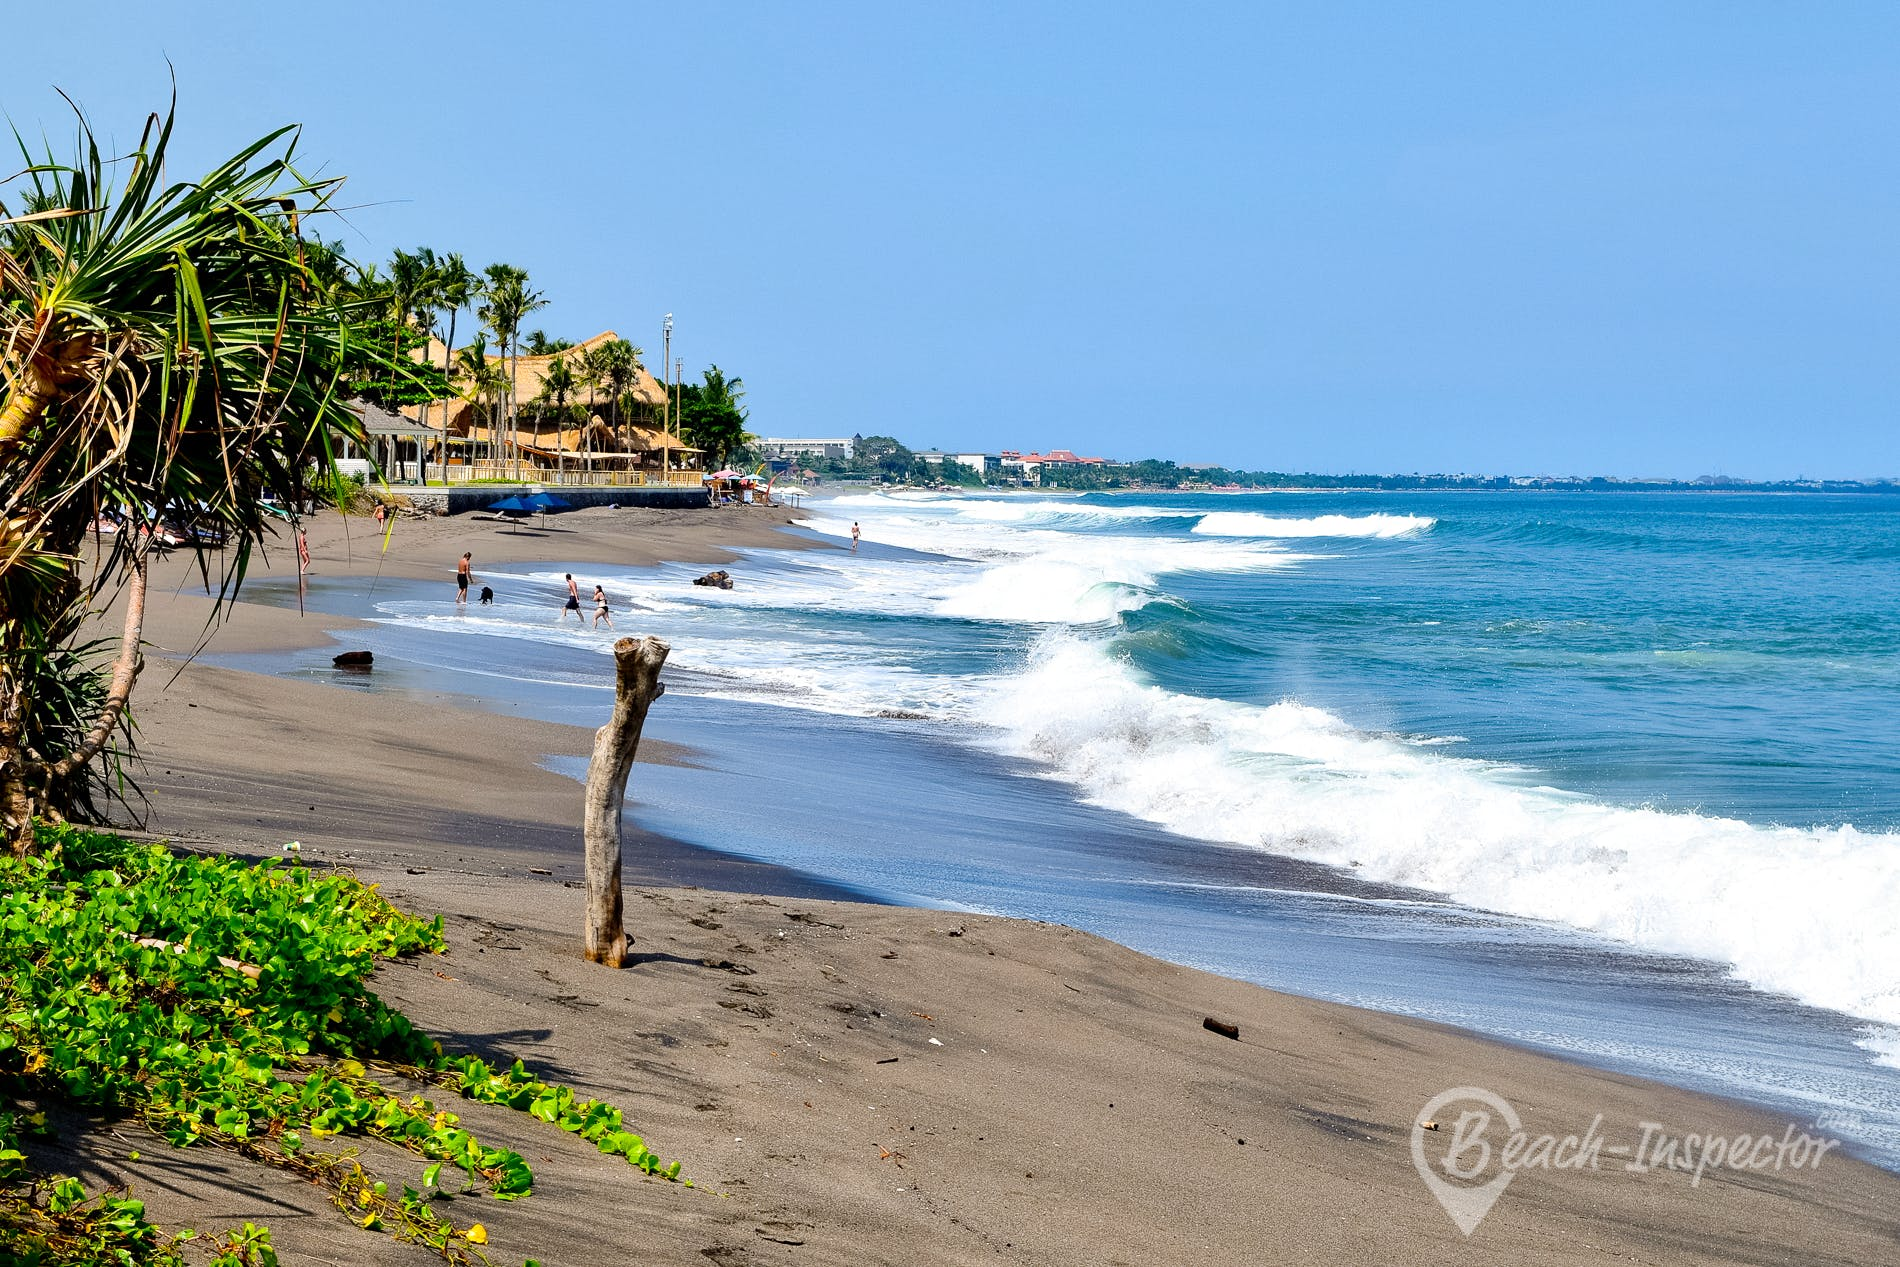 Beach Berawa Beach, Bali, Indonesia